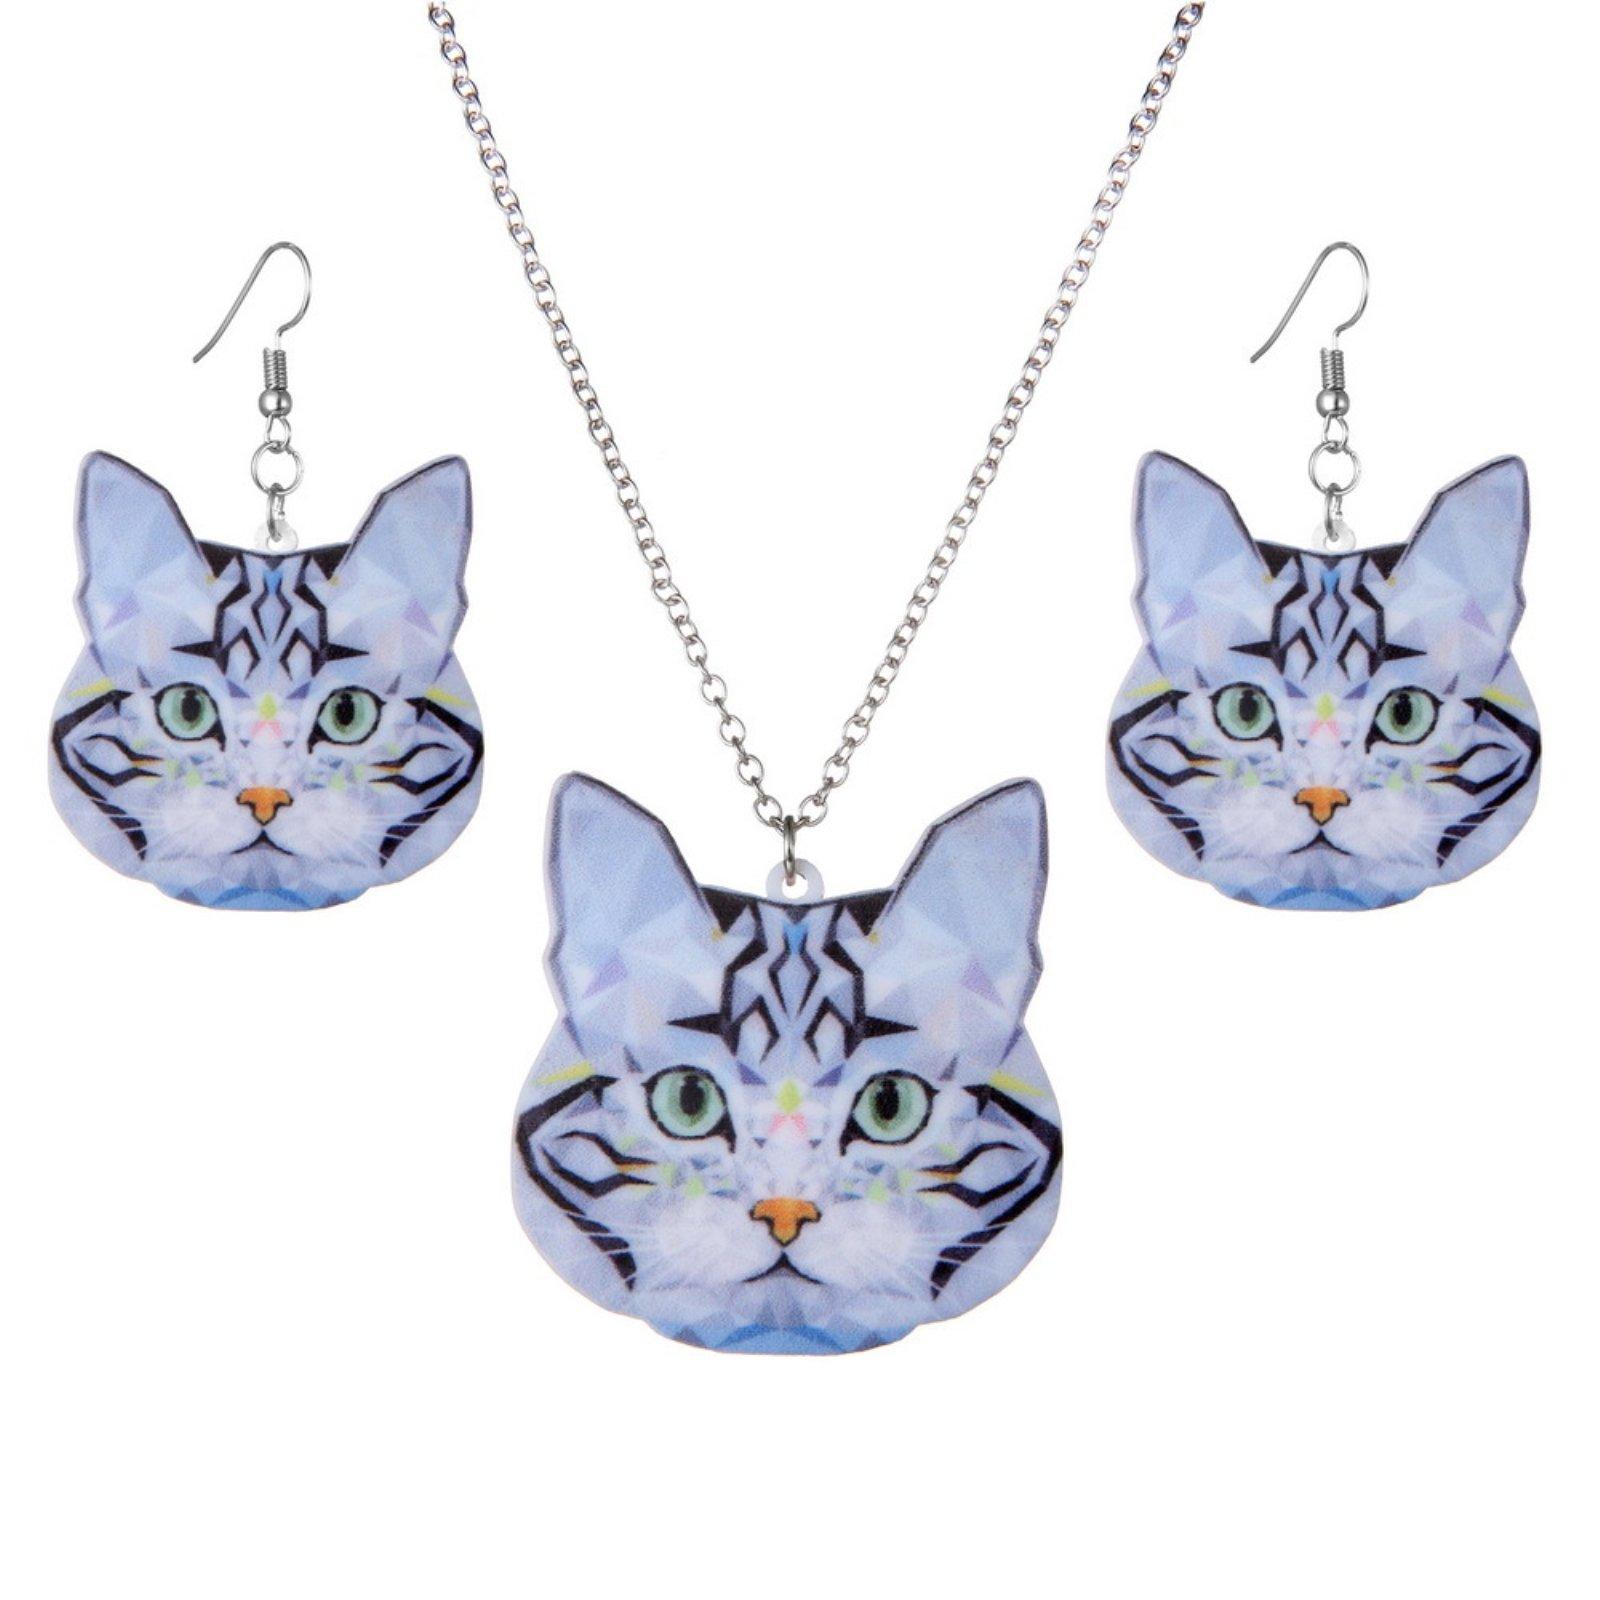 ptk12 Rinhoo Fashion Acrylic Statement Animal Cat Necklace Drop Earrings Jewelry Sets Jewelry